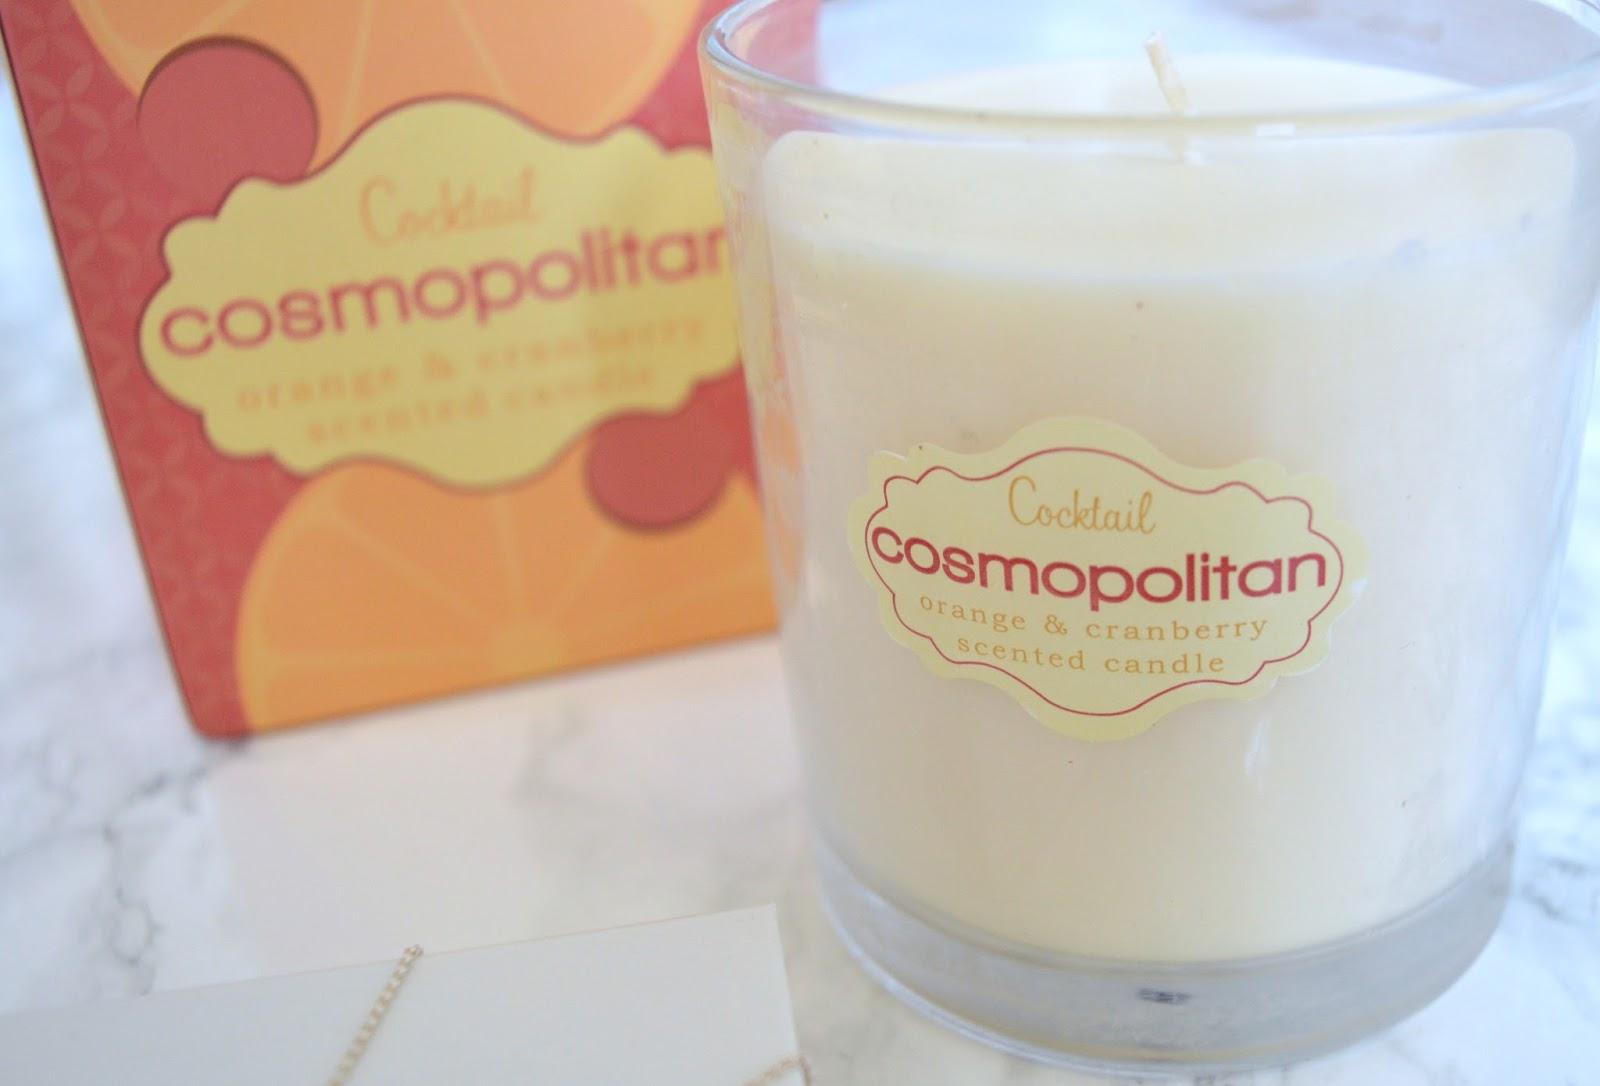 Cosmopolitan Cocktail Candle